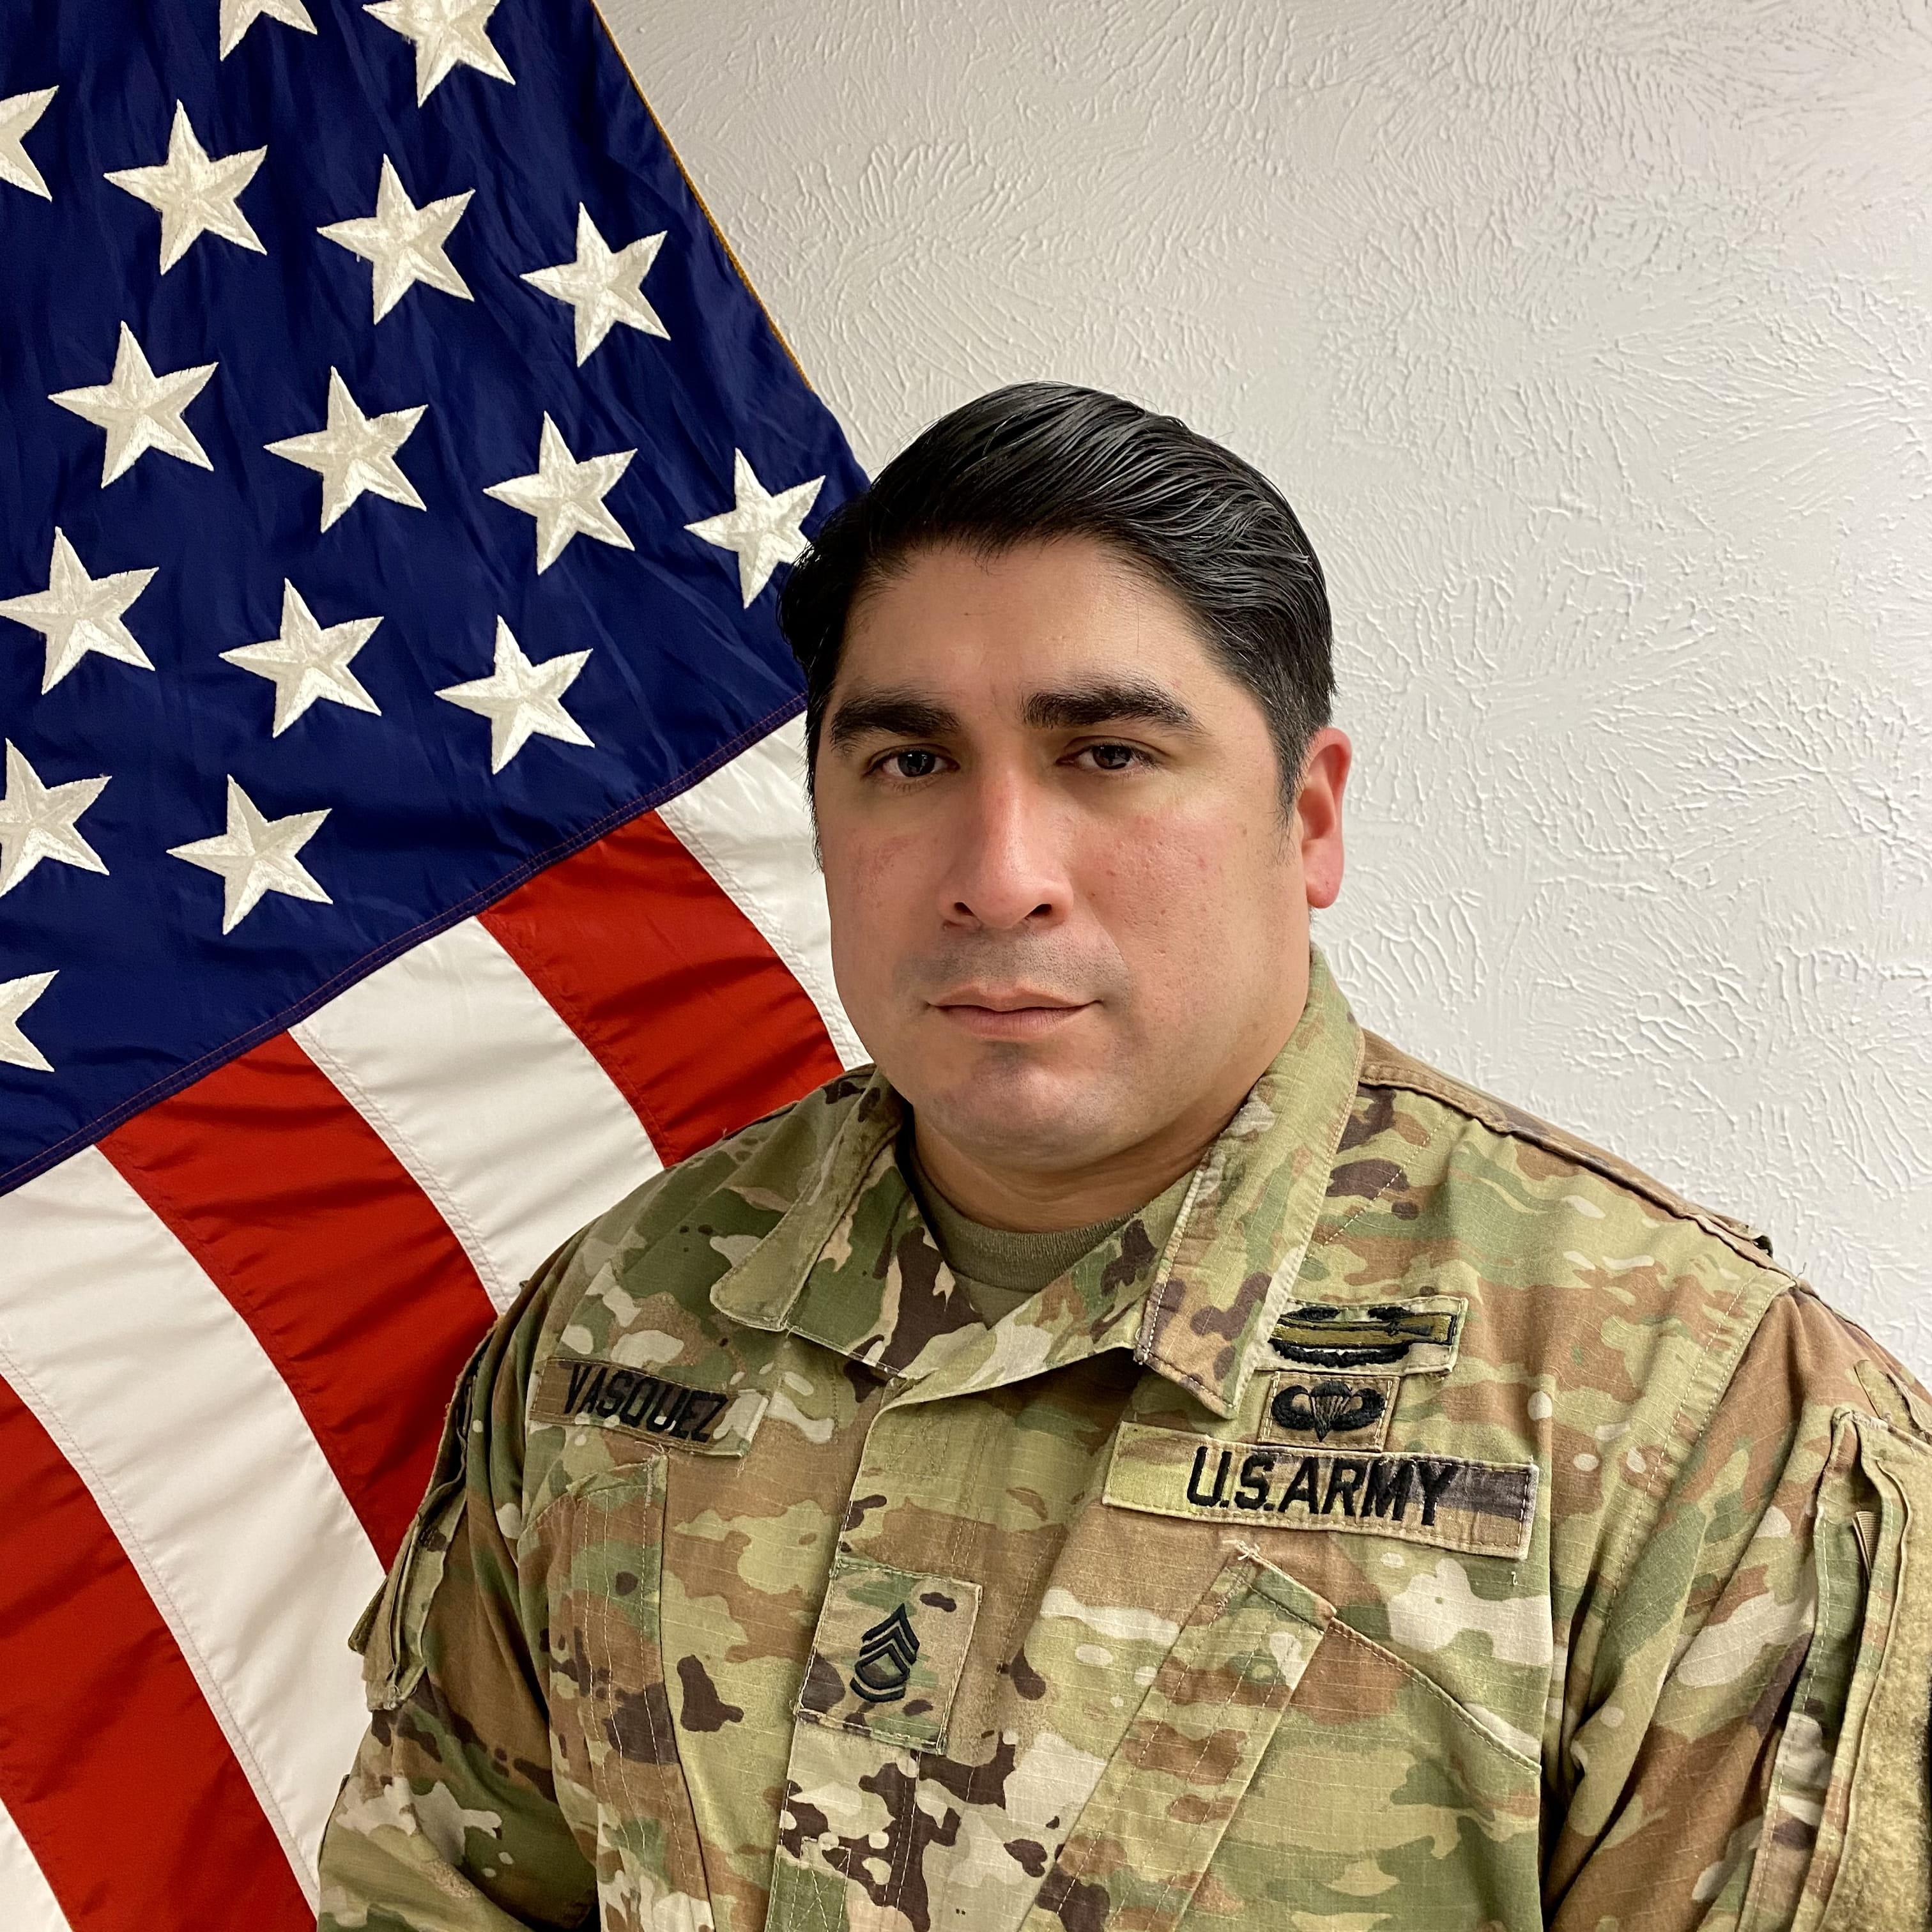 Sergeant First Class Johnny Vasquez